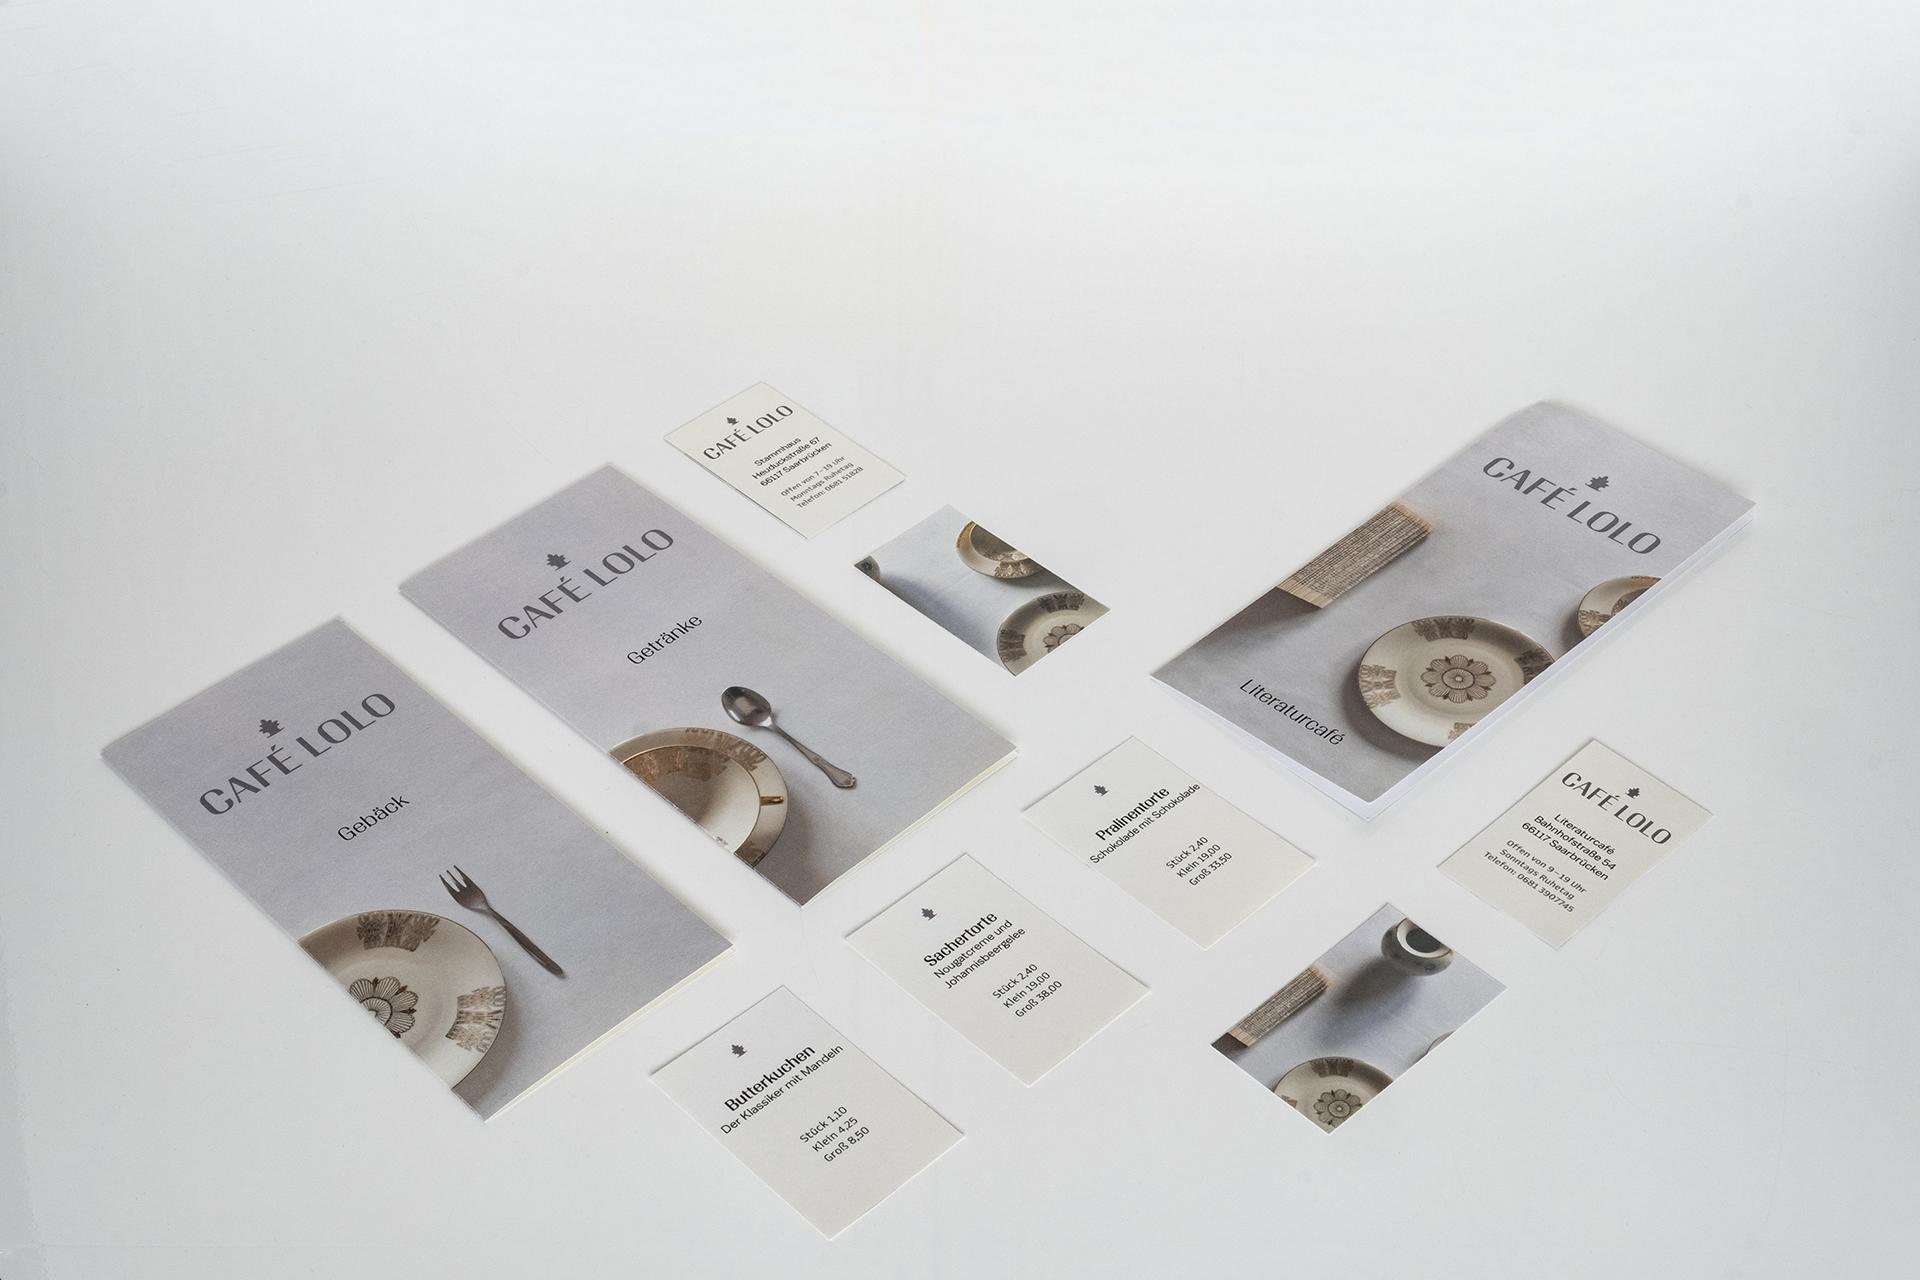 Cafe Lolo Restaurant Staionary Redesign, Sebastian Knöbber